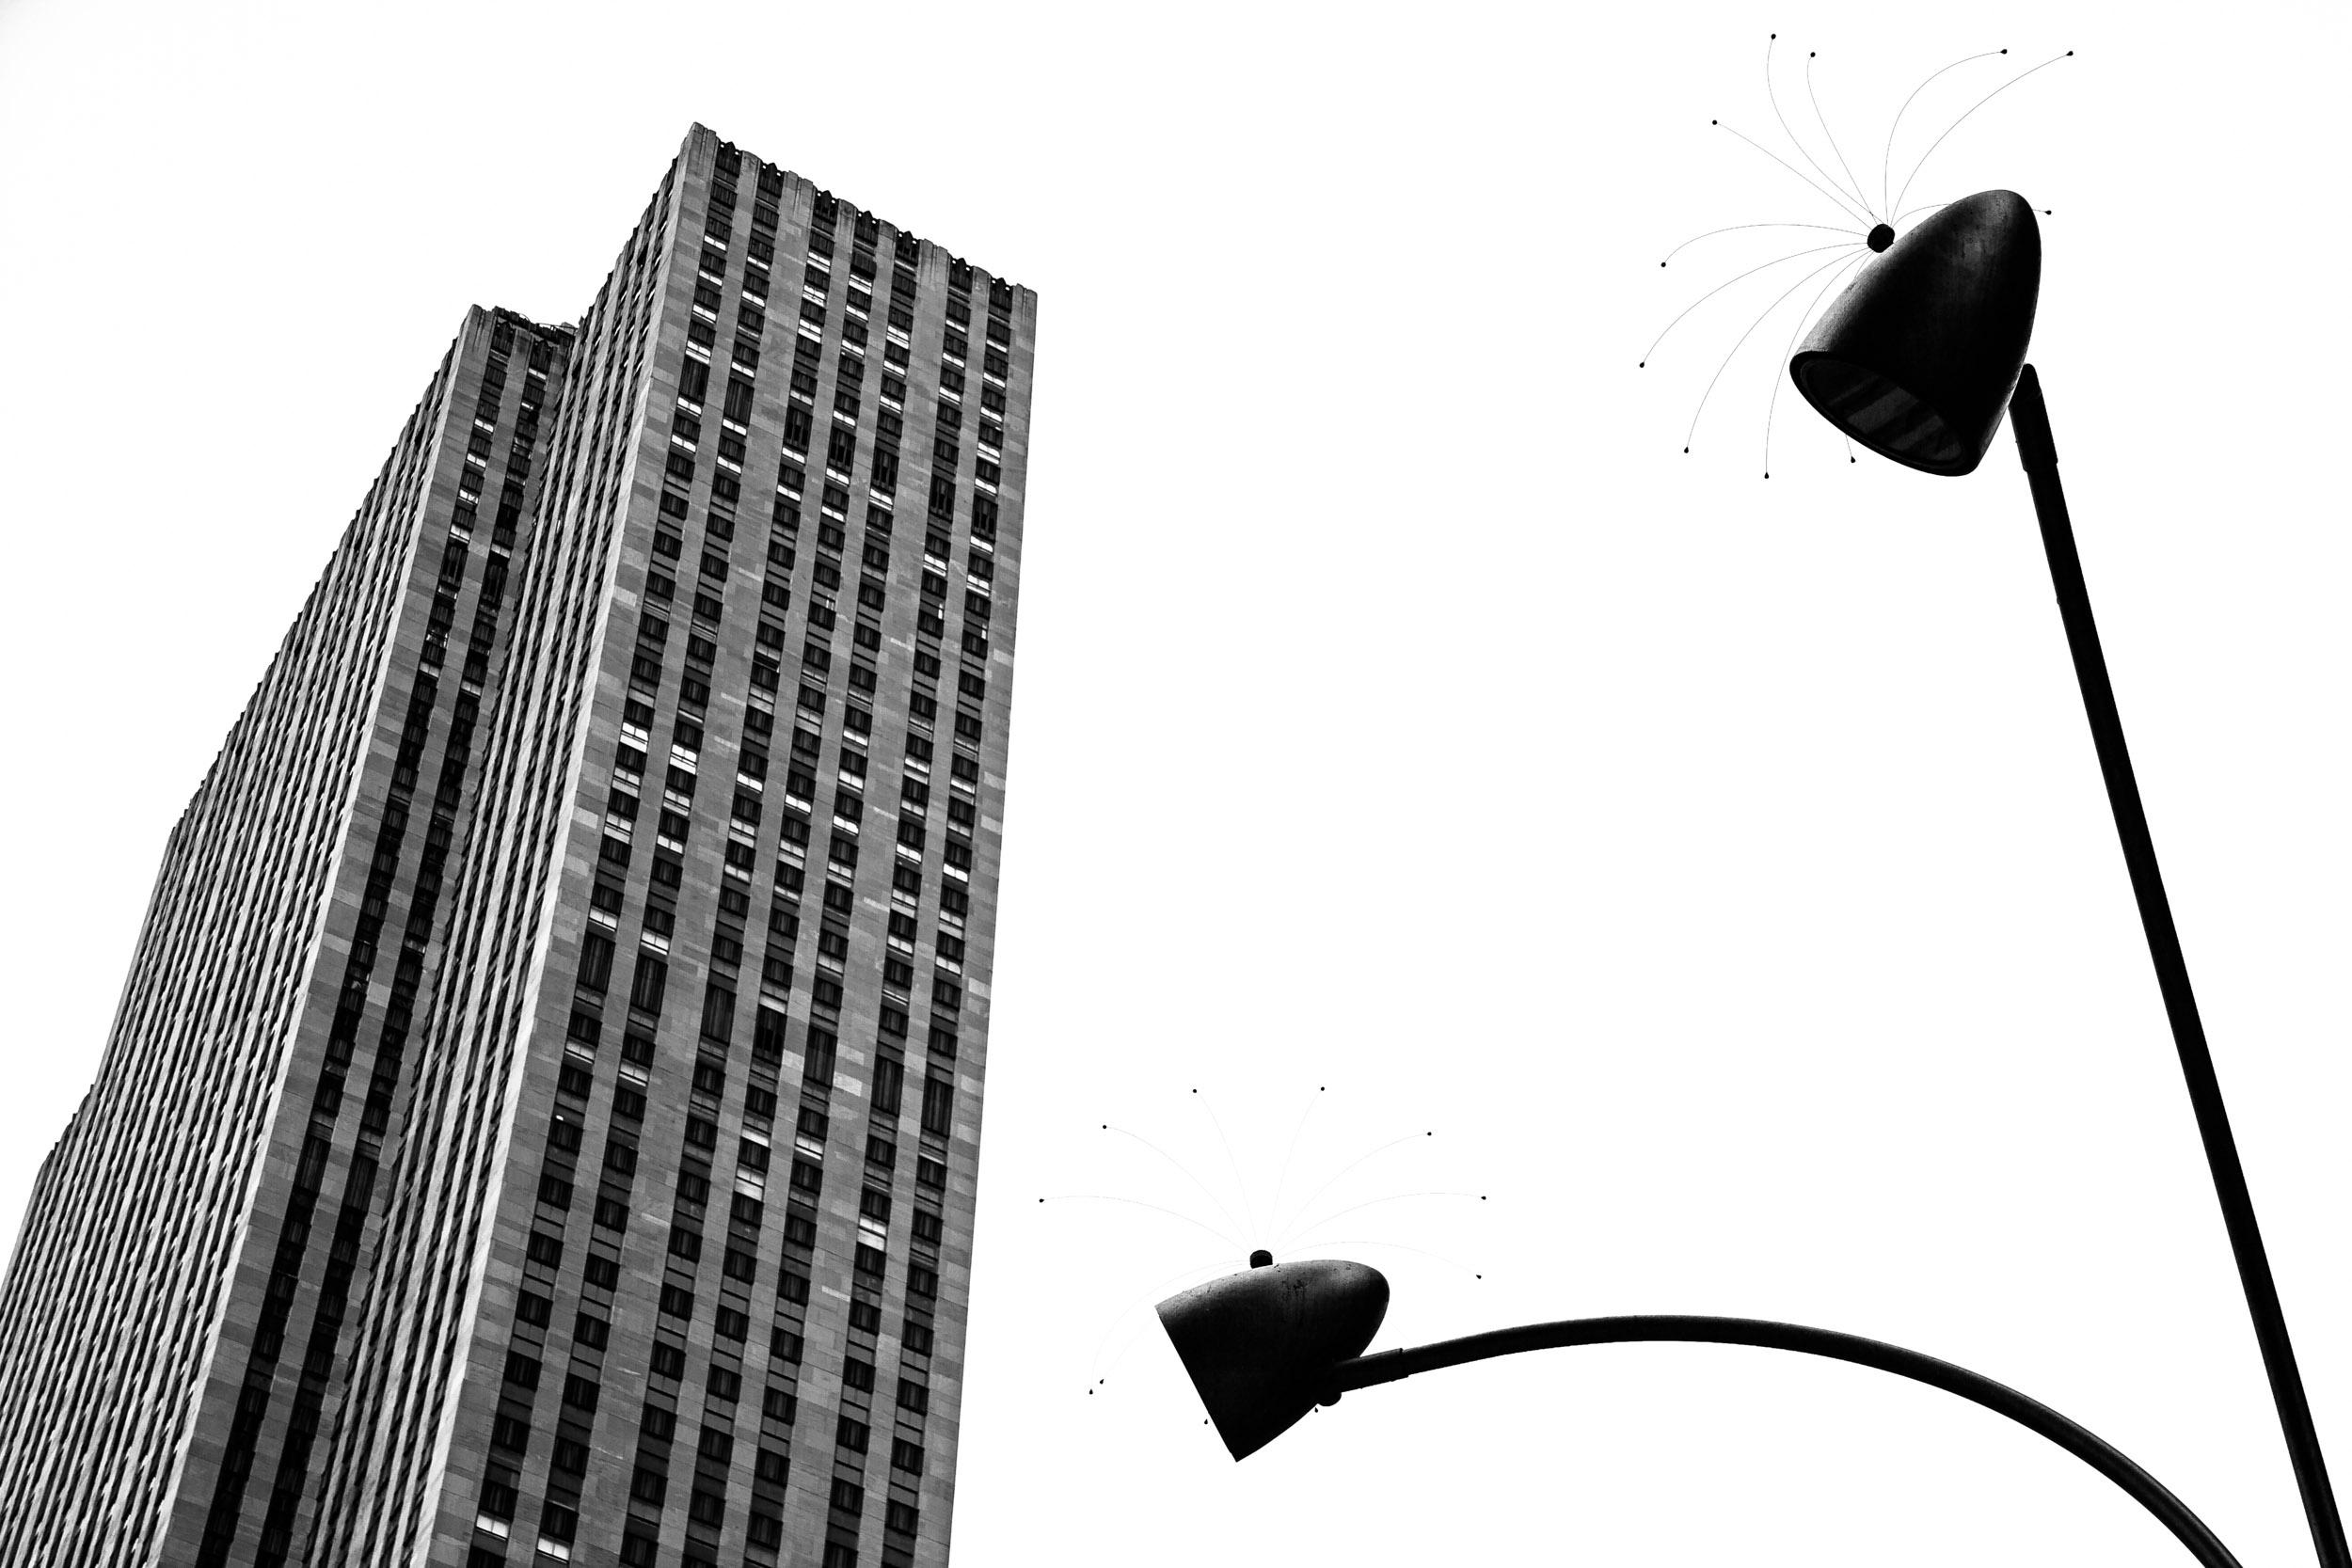 Streetlights of New York #27 New York, NY 2010